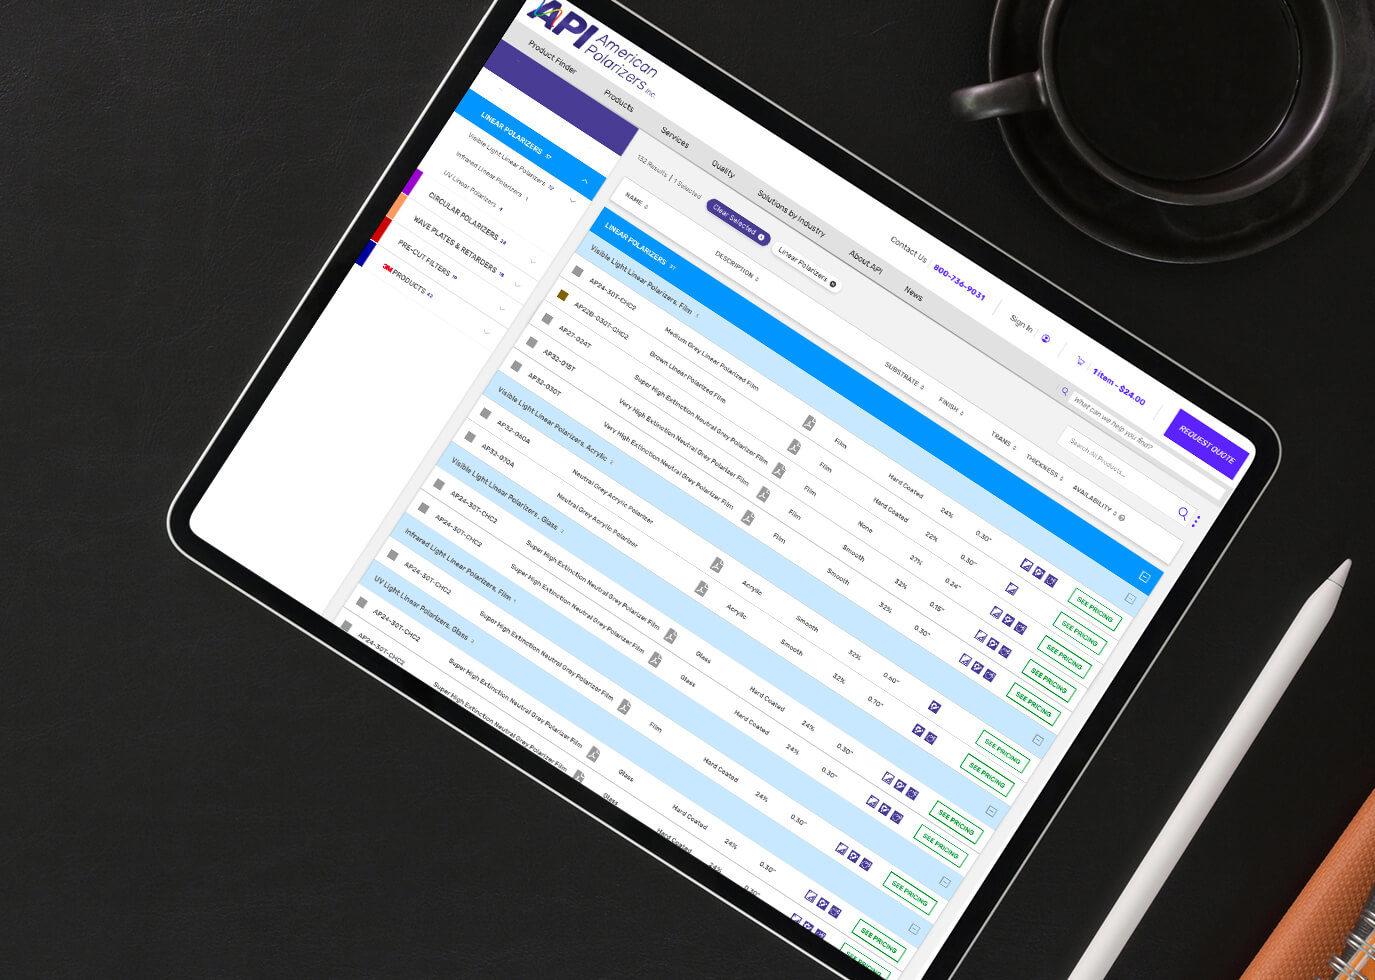 Product Finder on tablet